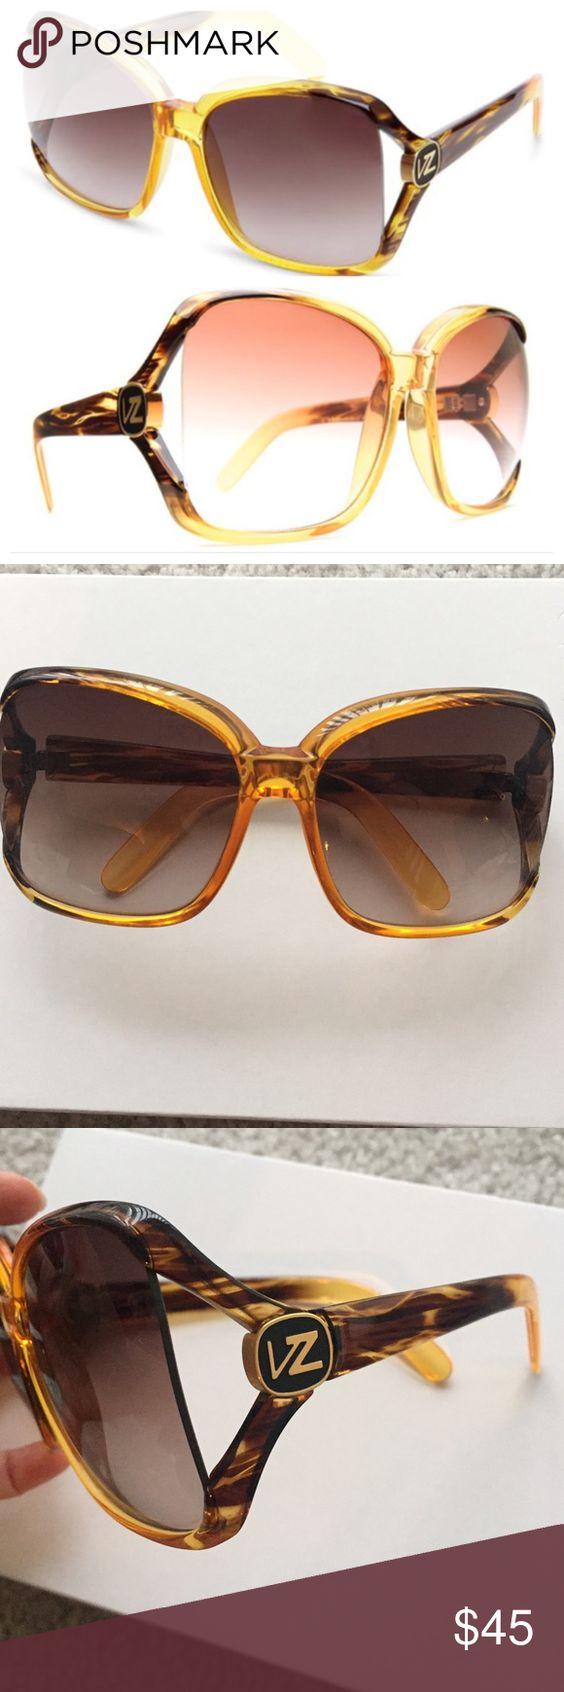 Von Zipper Dharma Sunglasses Von Zipper Dharma sunglasses - brown.  No scratches. Von Zipper Accessories Sunglasses